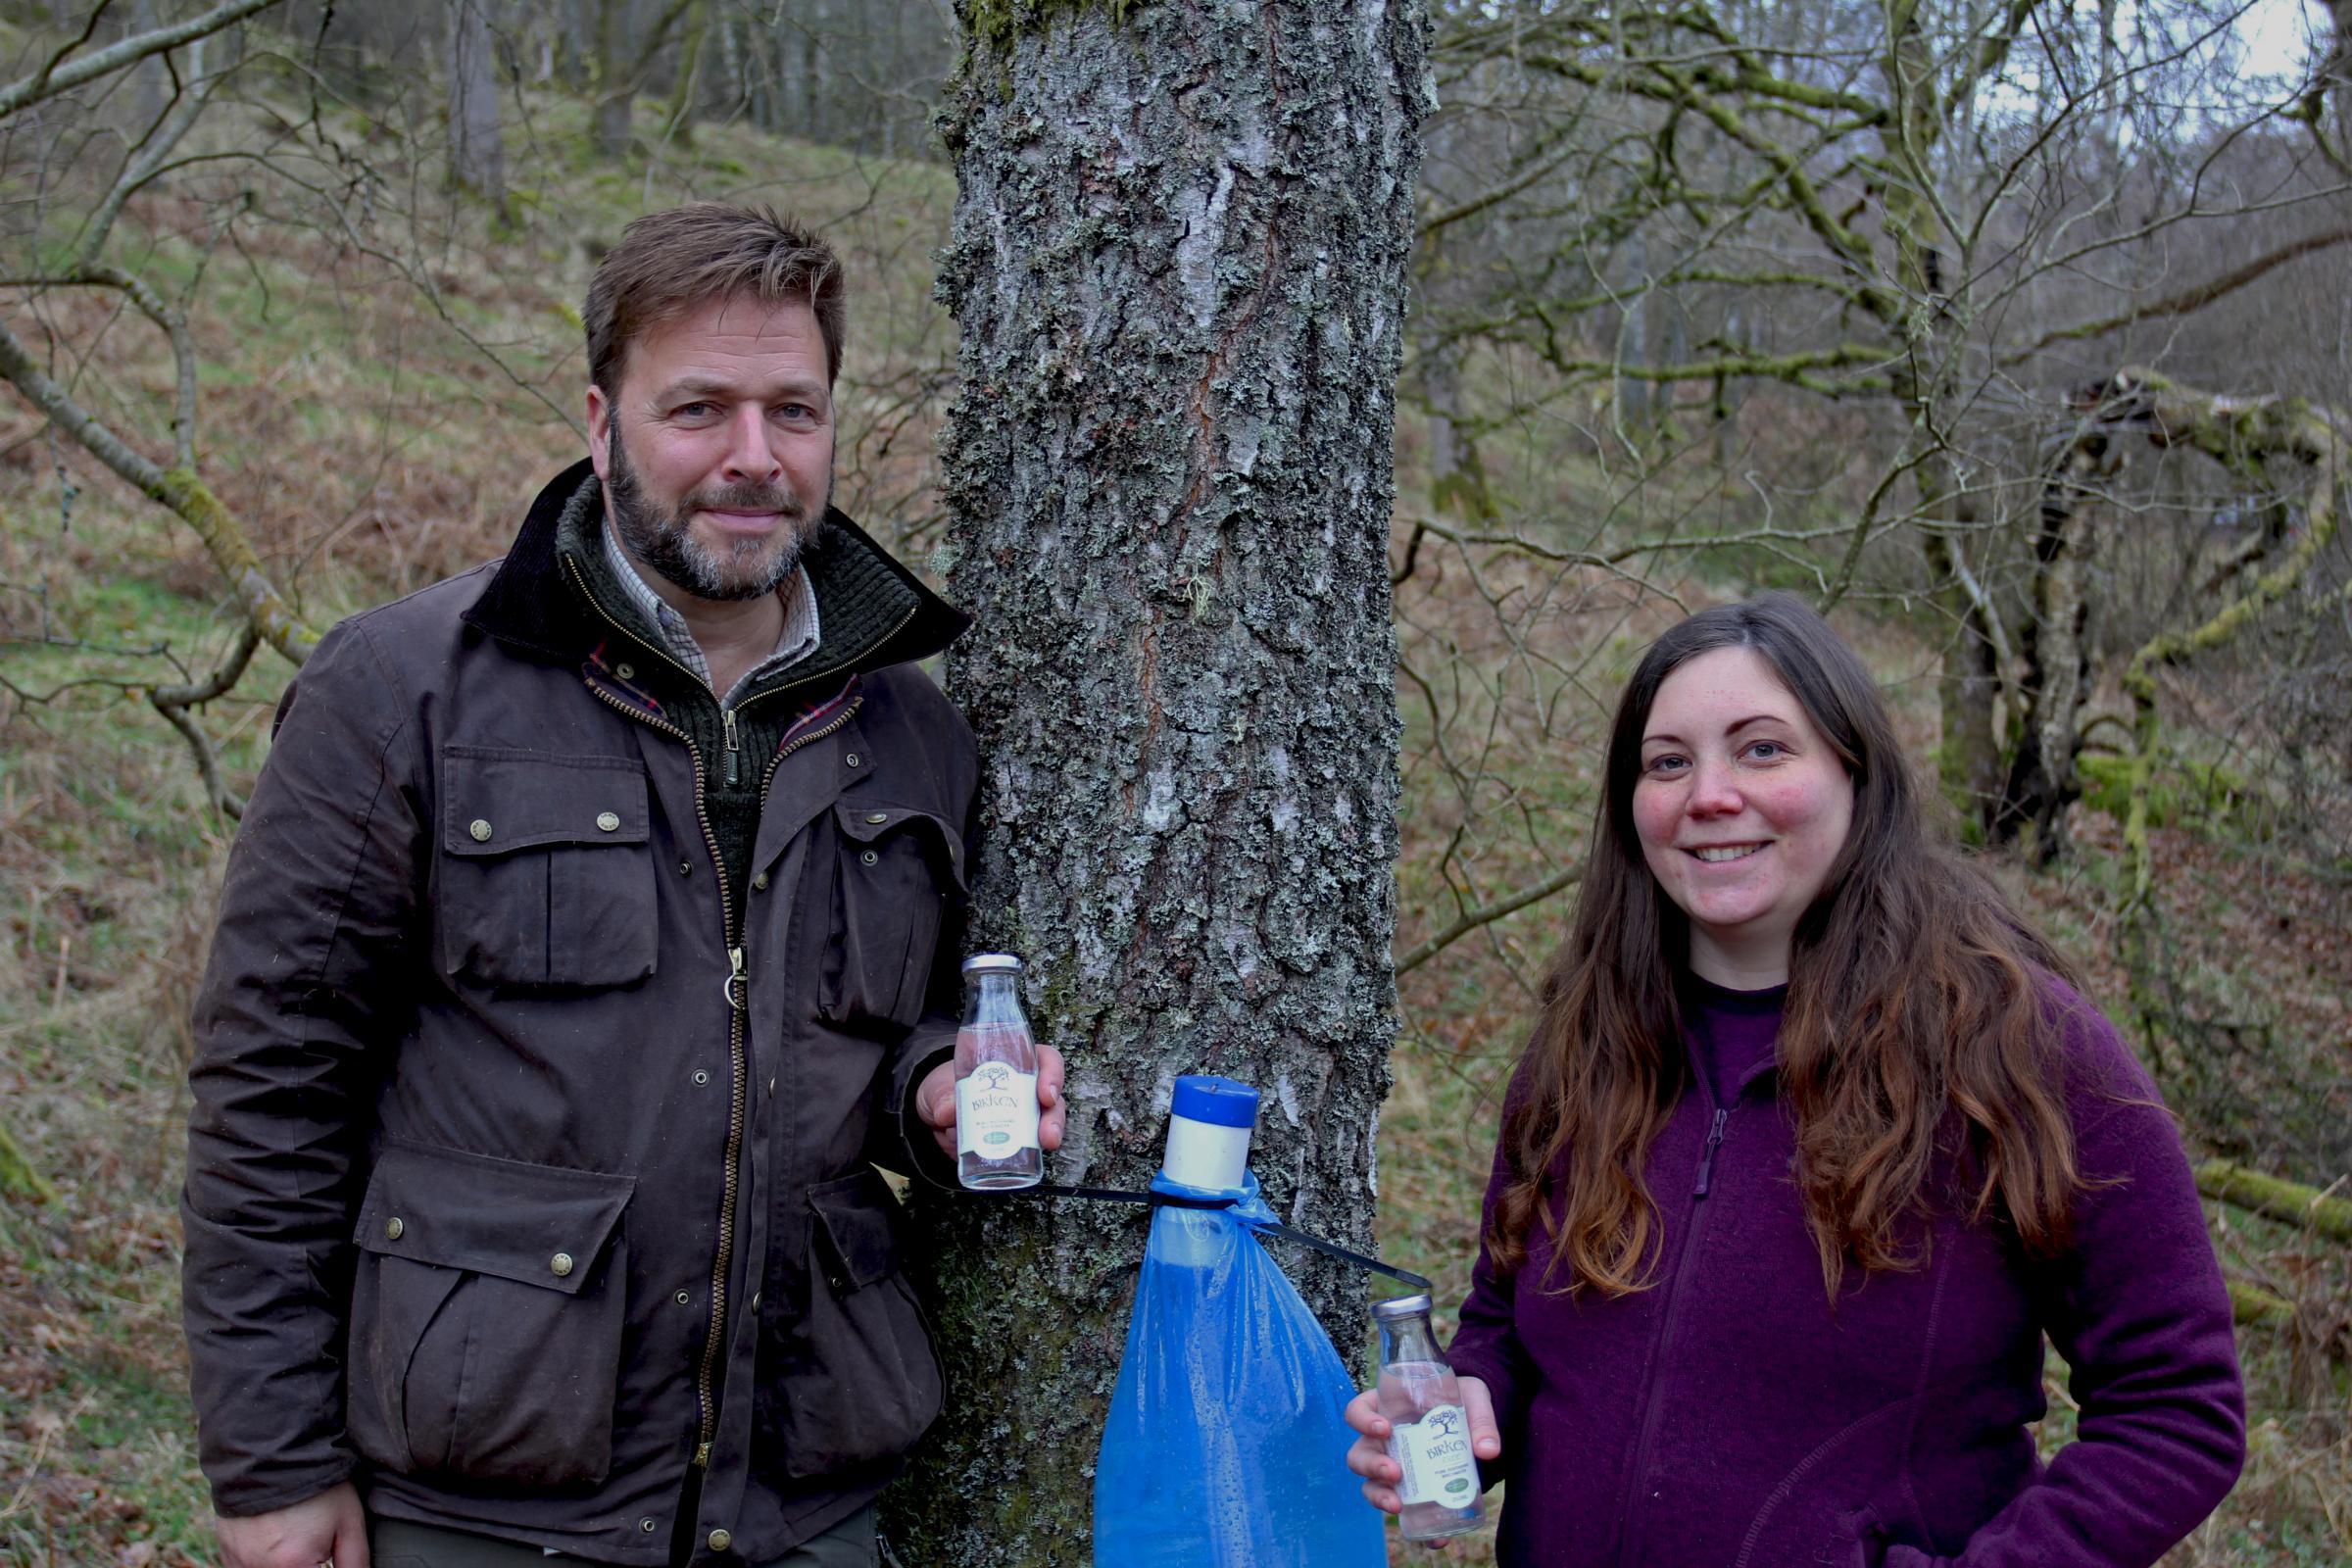 Perthshire Birchwater pioneers tap treasure of Scots woods